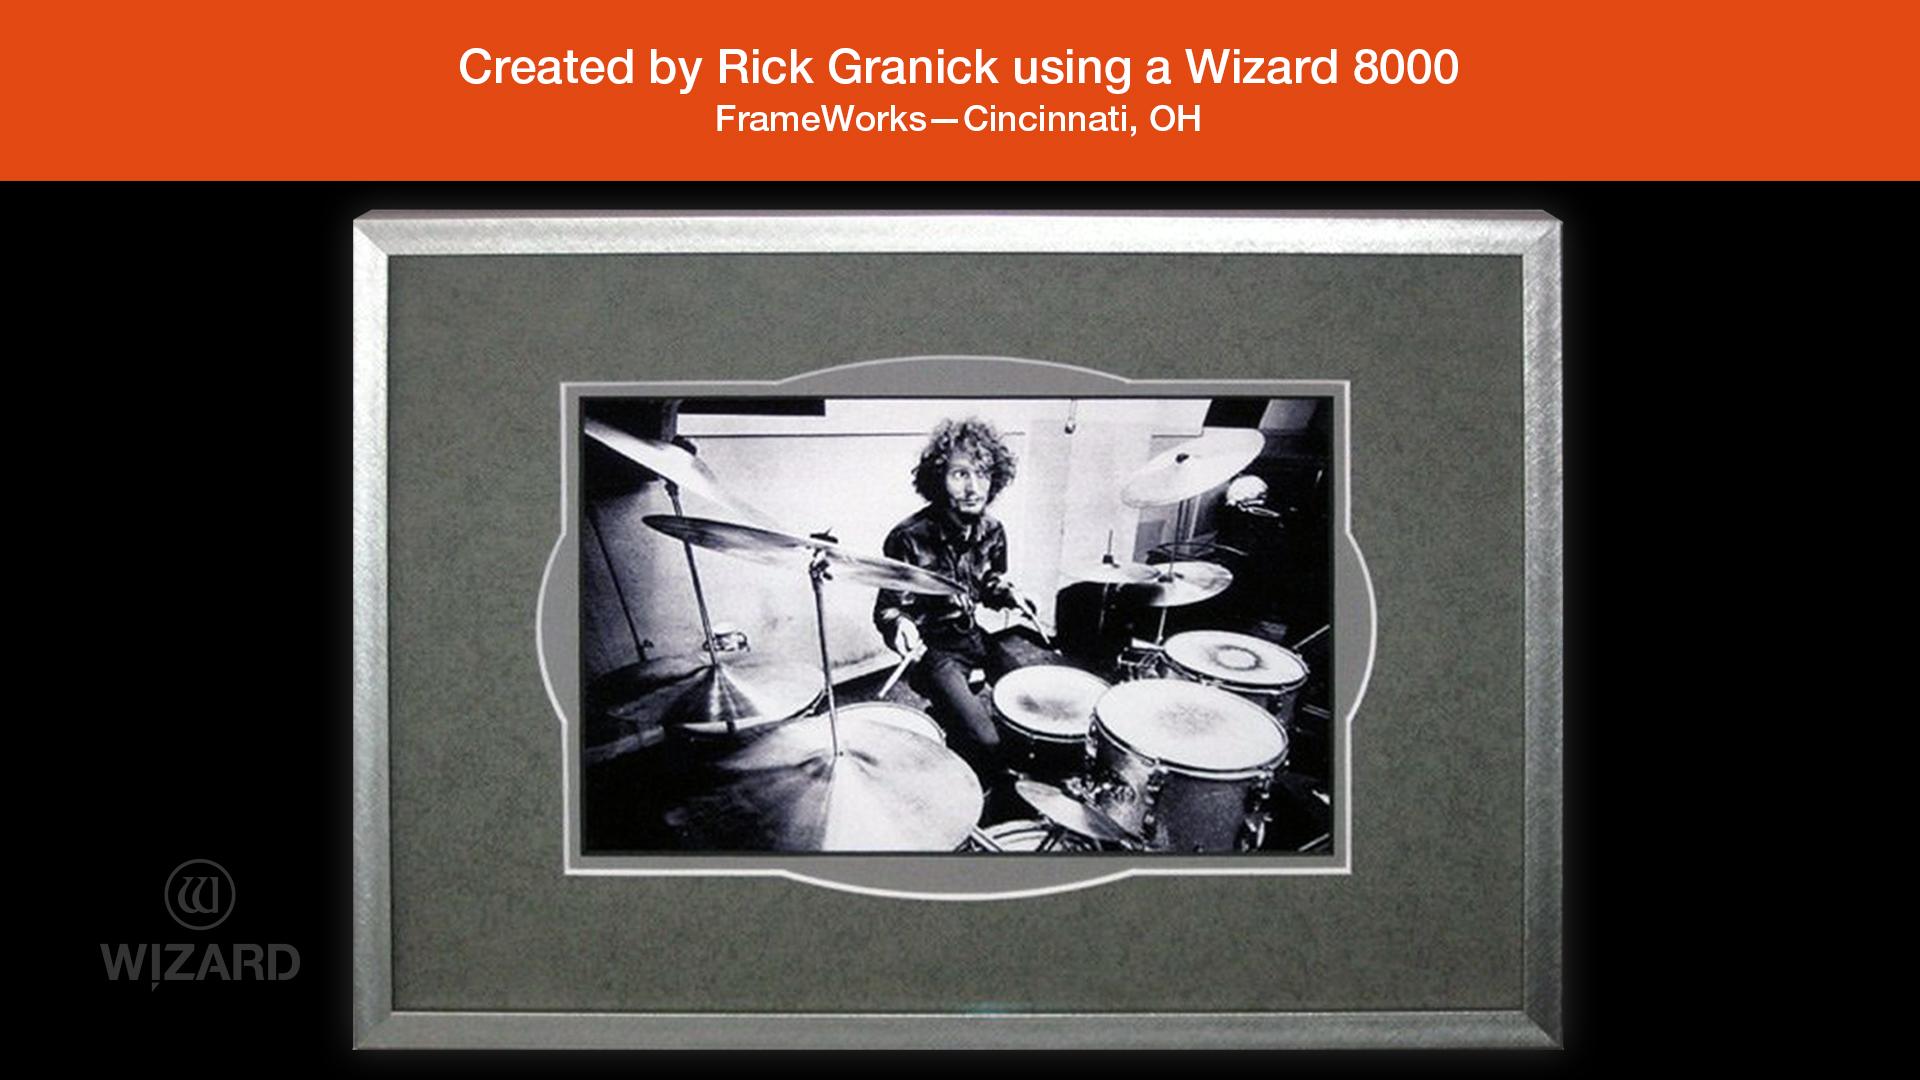 rick-granick-1.jpg